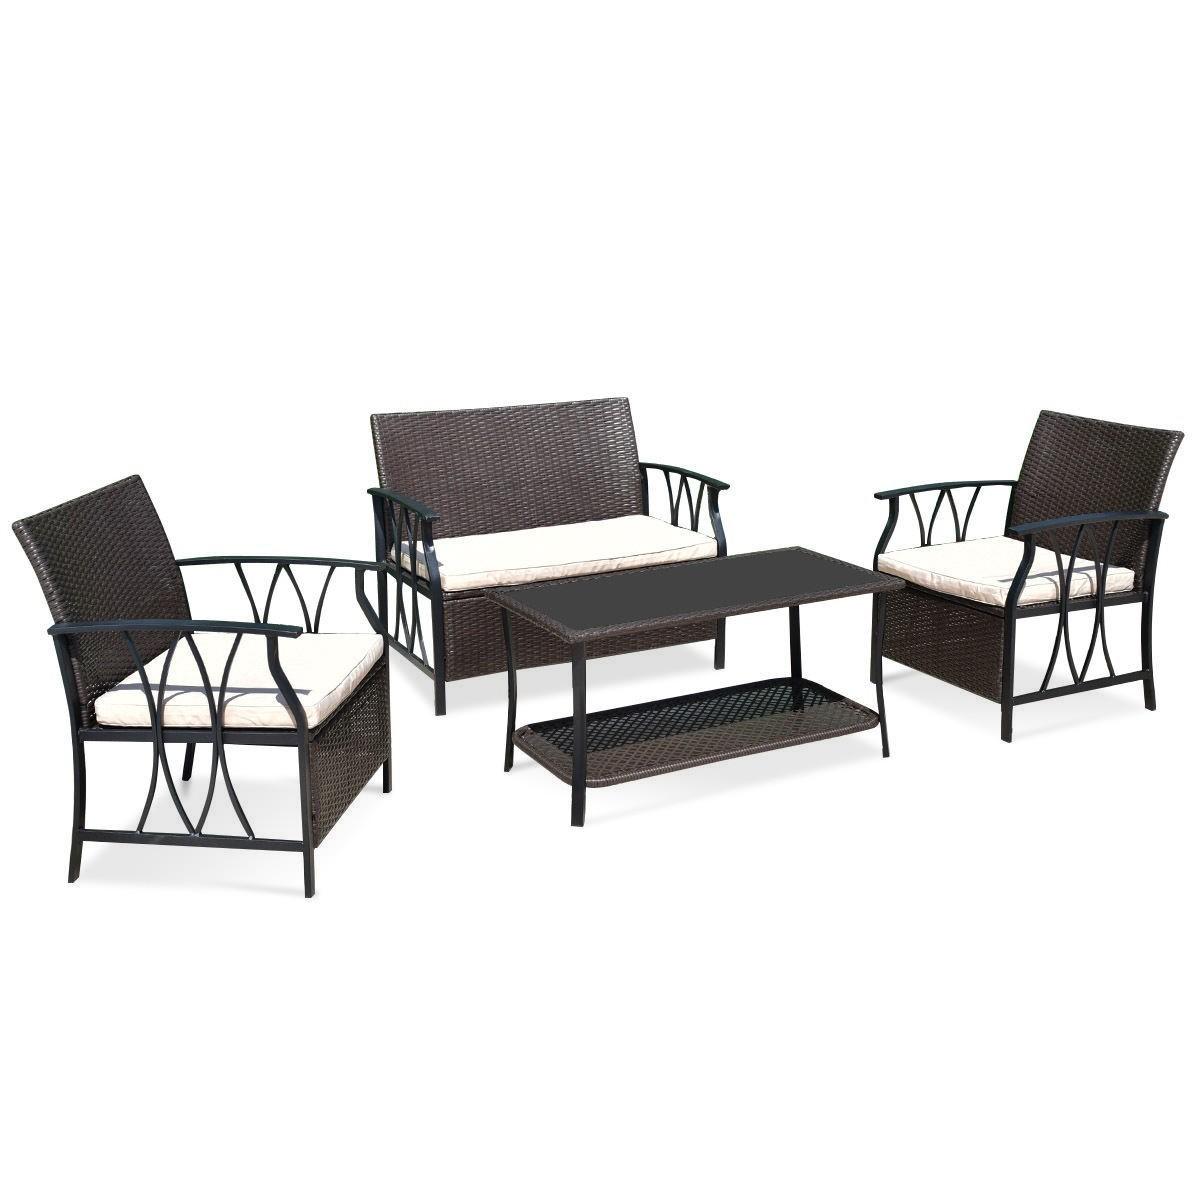 4 pcs Outdoor Wicker Furniture Set w  PE Cushion by